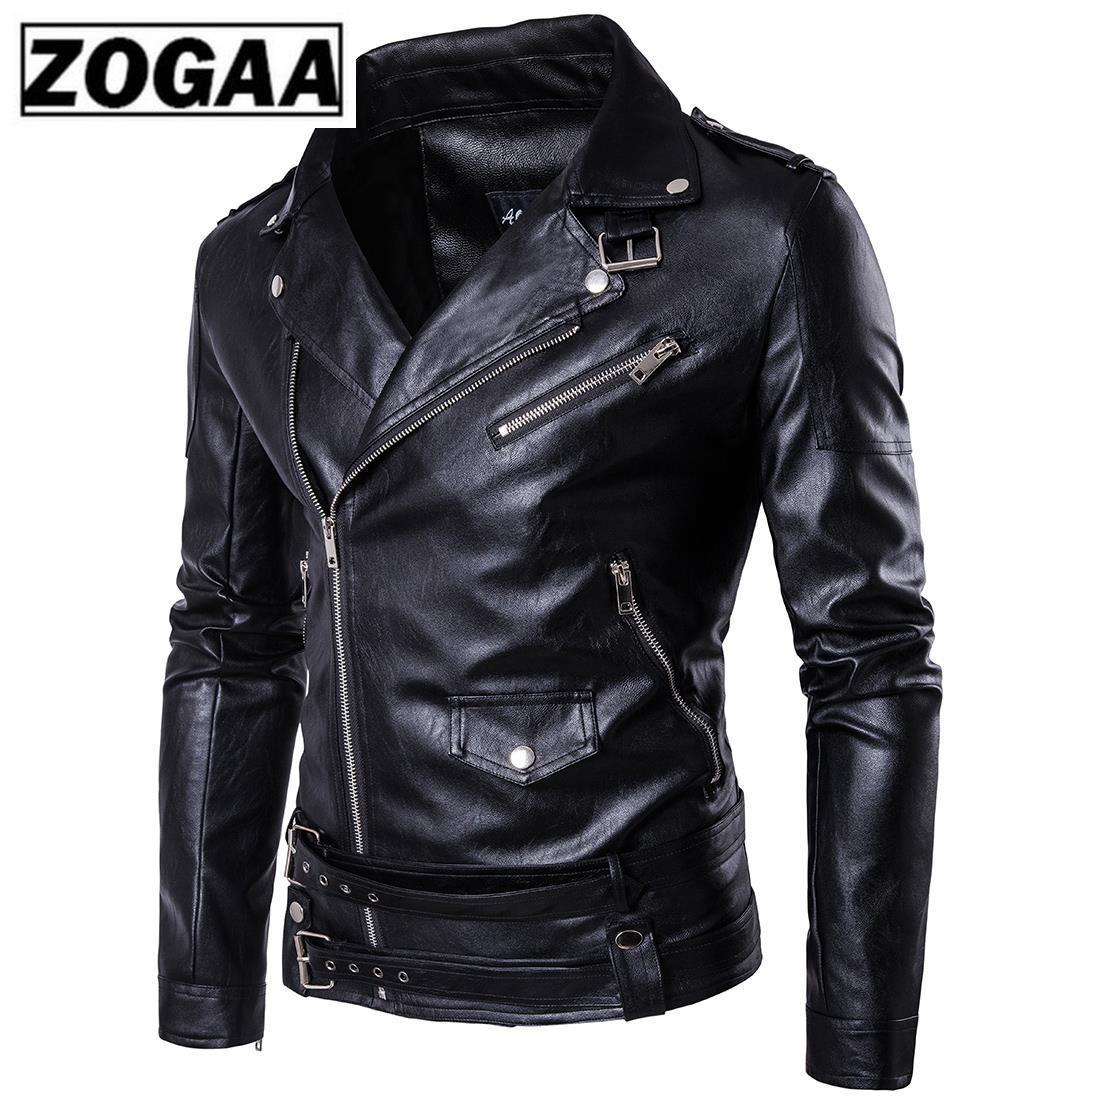 Motorcycle Leather Jacket Classic Design Multi Zippers Men's Locomotive Jackets Bomber Leather Jacket Coat Windbreaker Eur Size